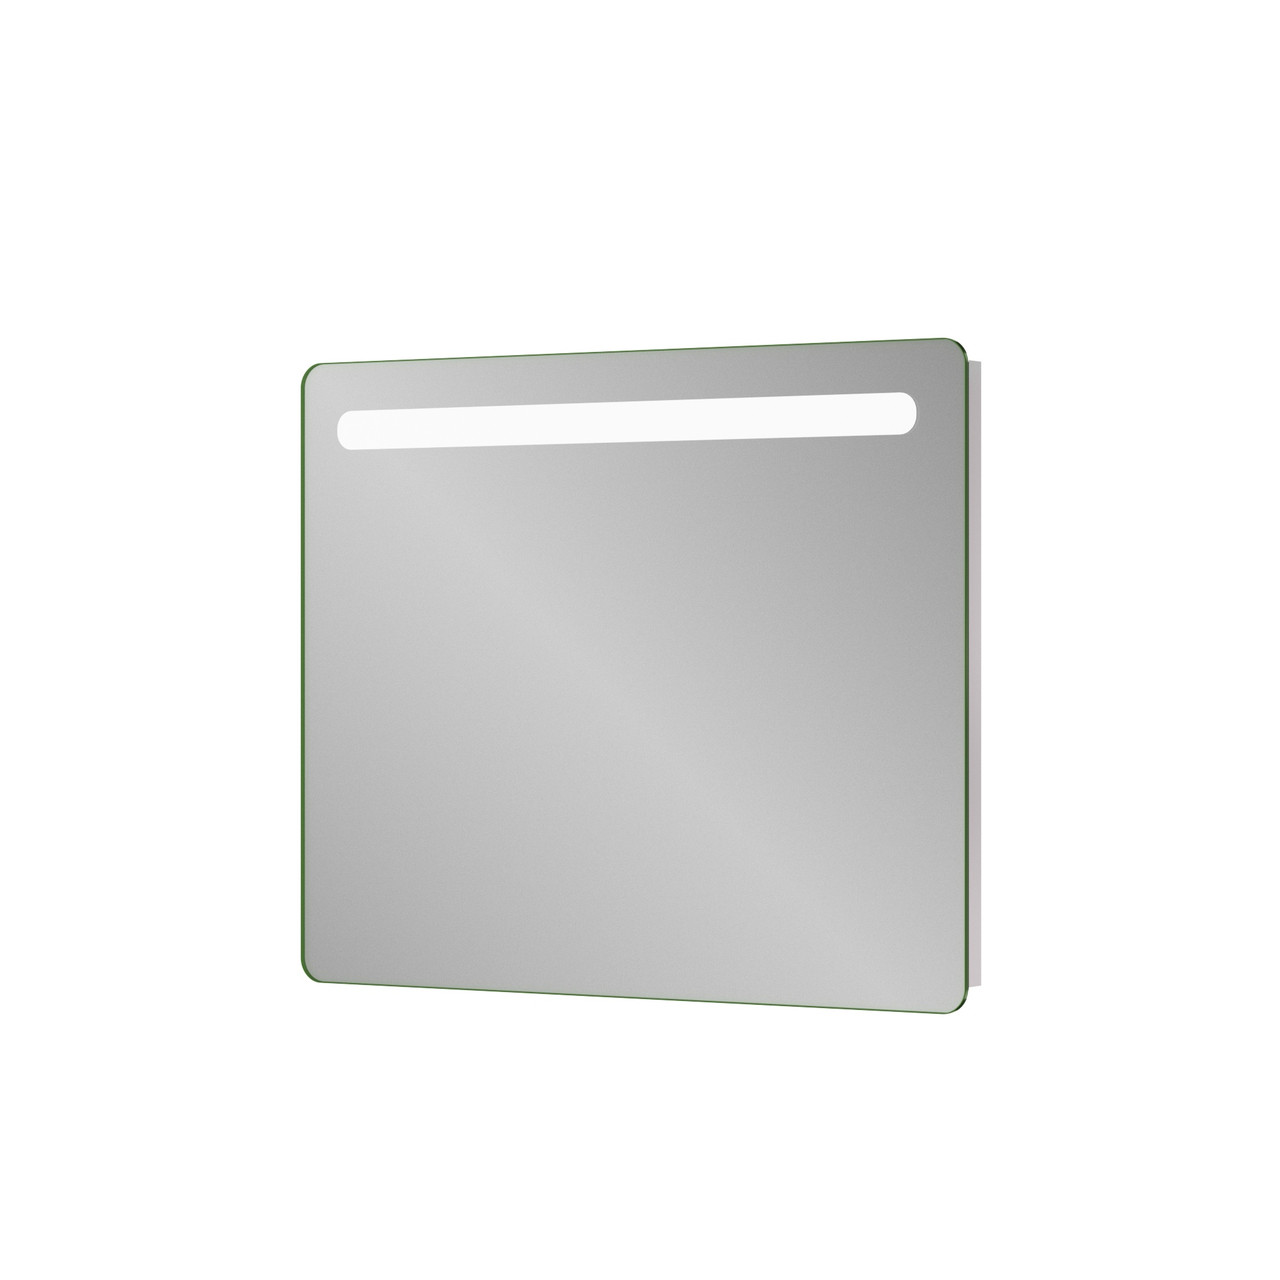 Зеркало Sanwerk LAVA «Calipso» 800 × 650